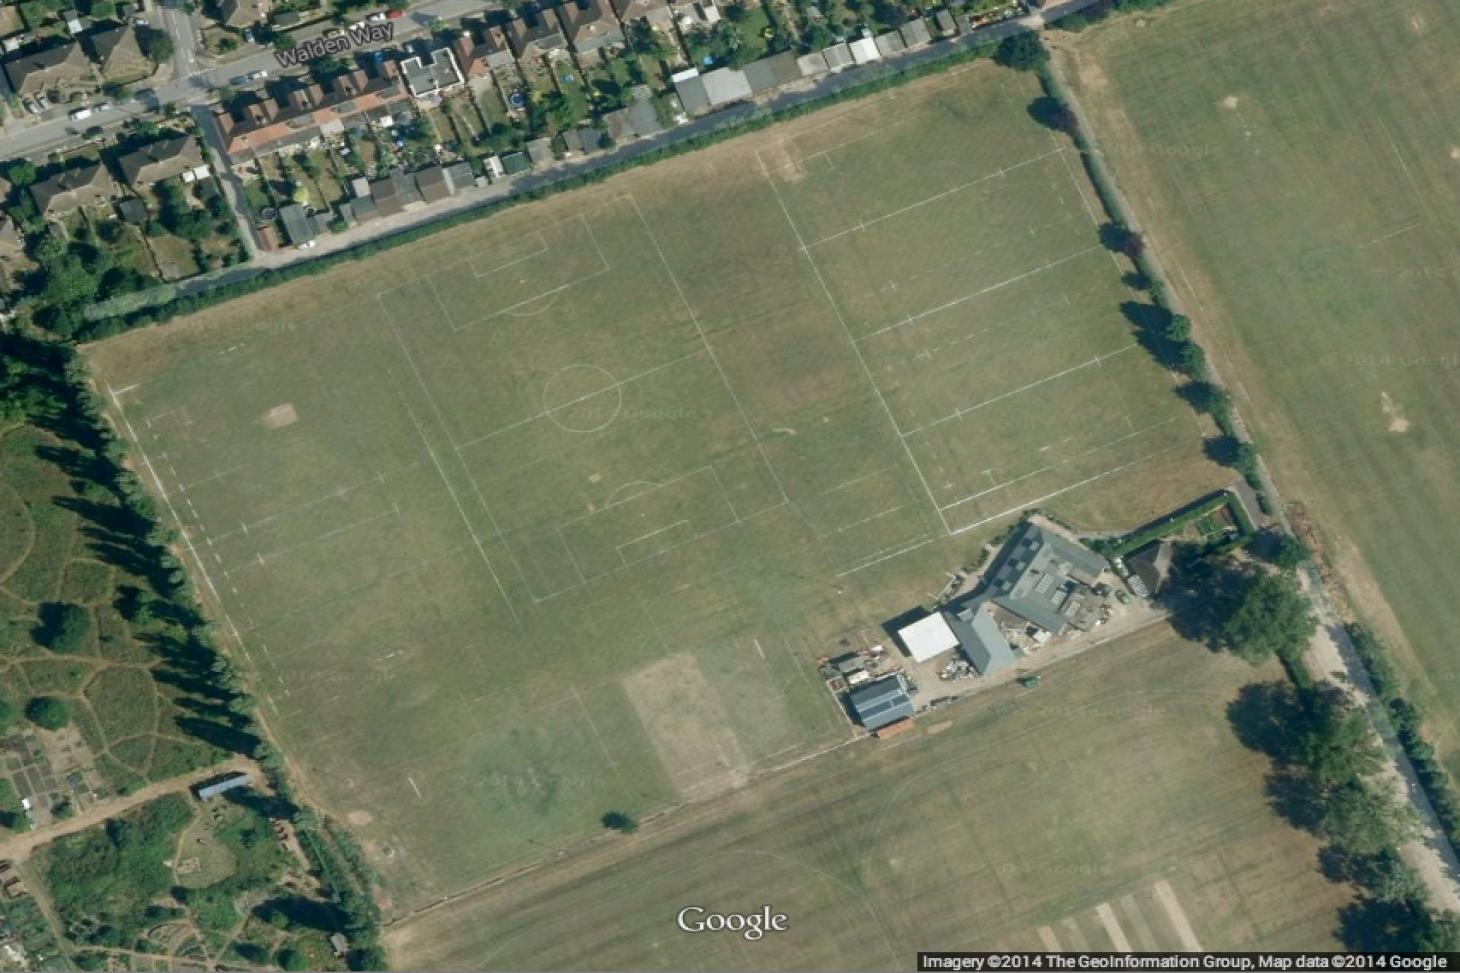 Fairlop Oak Playing Field 11 a side | Grass football pitch